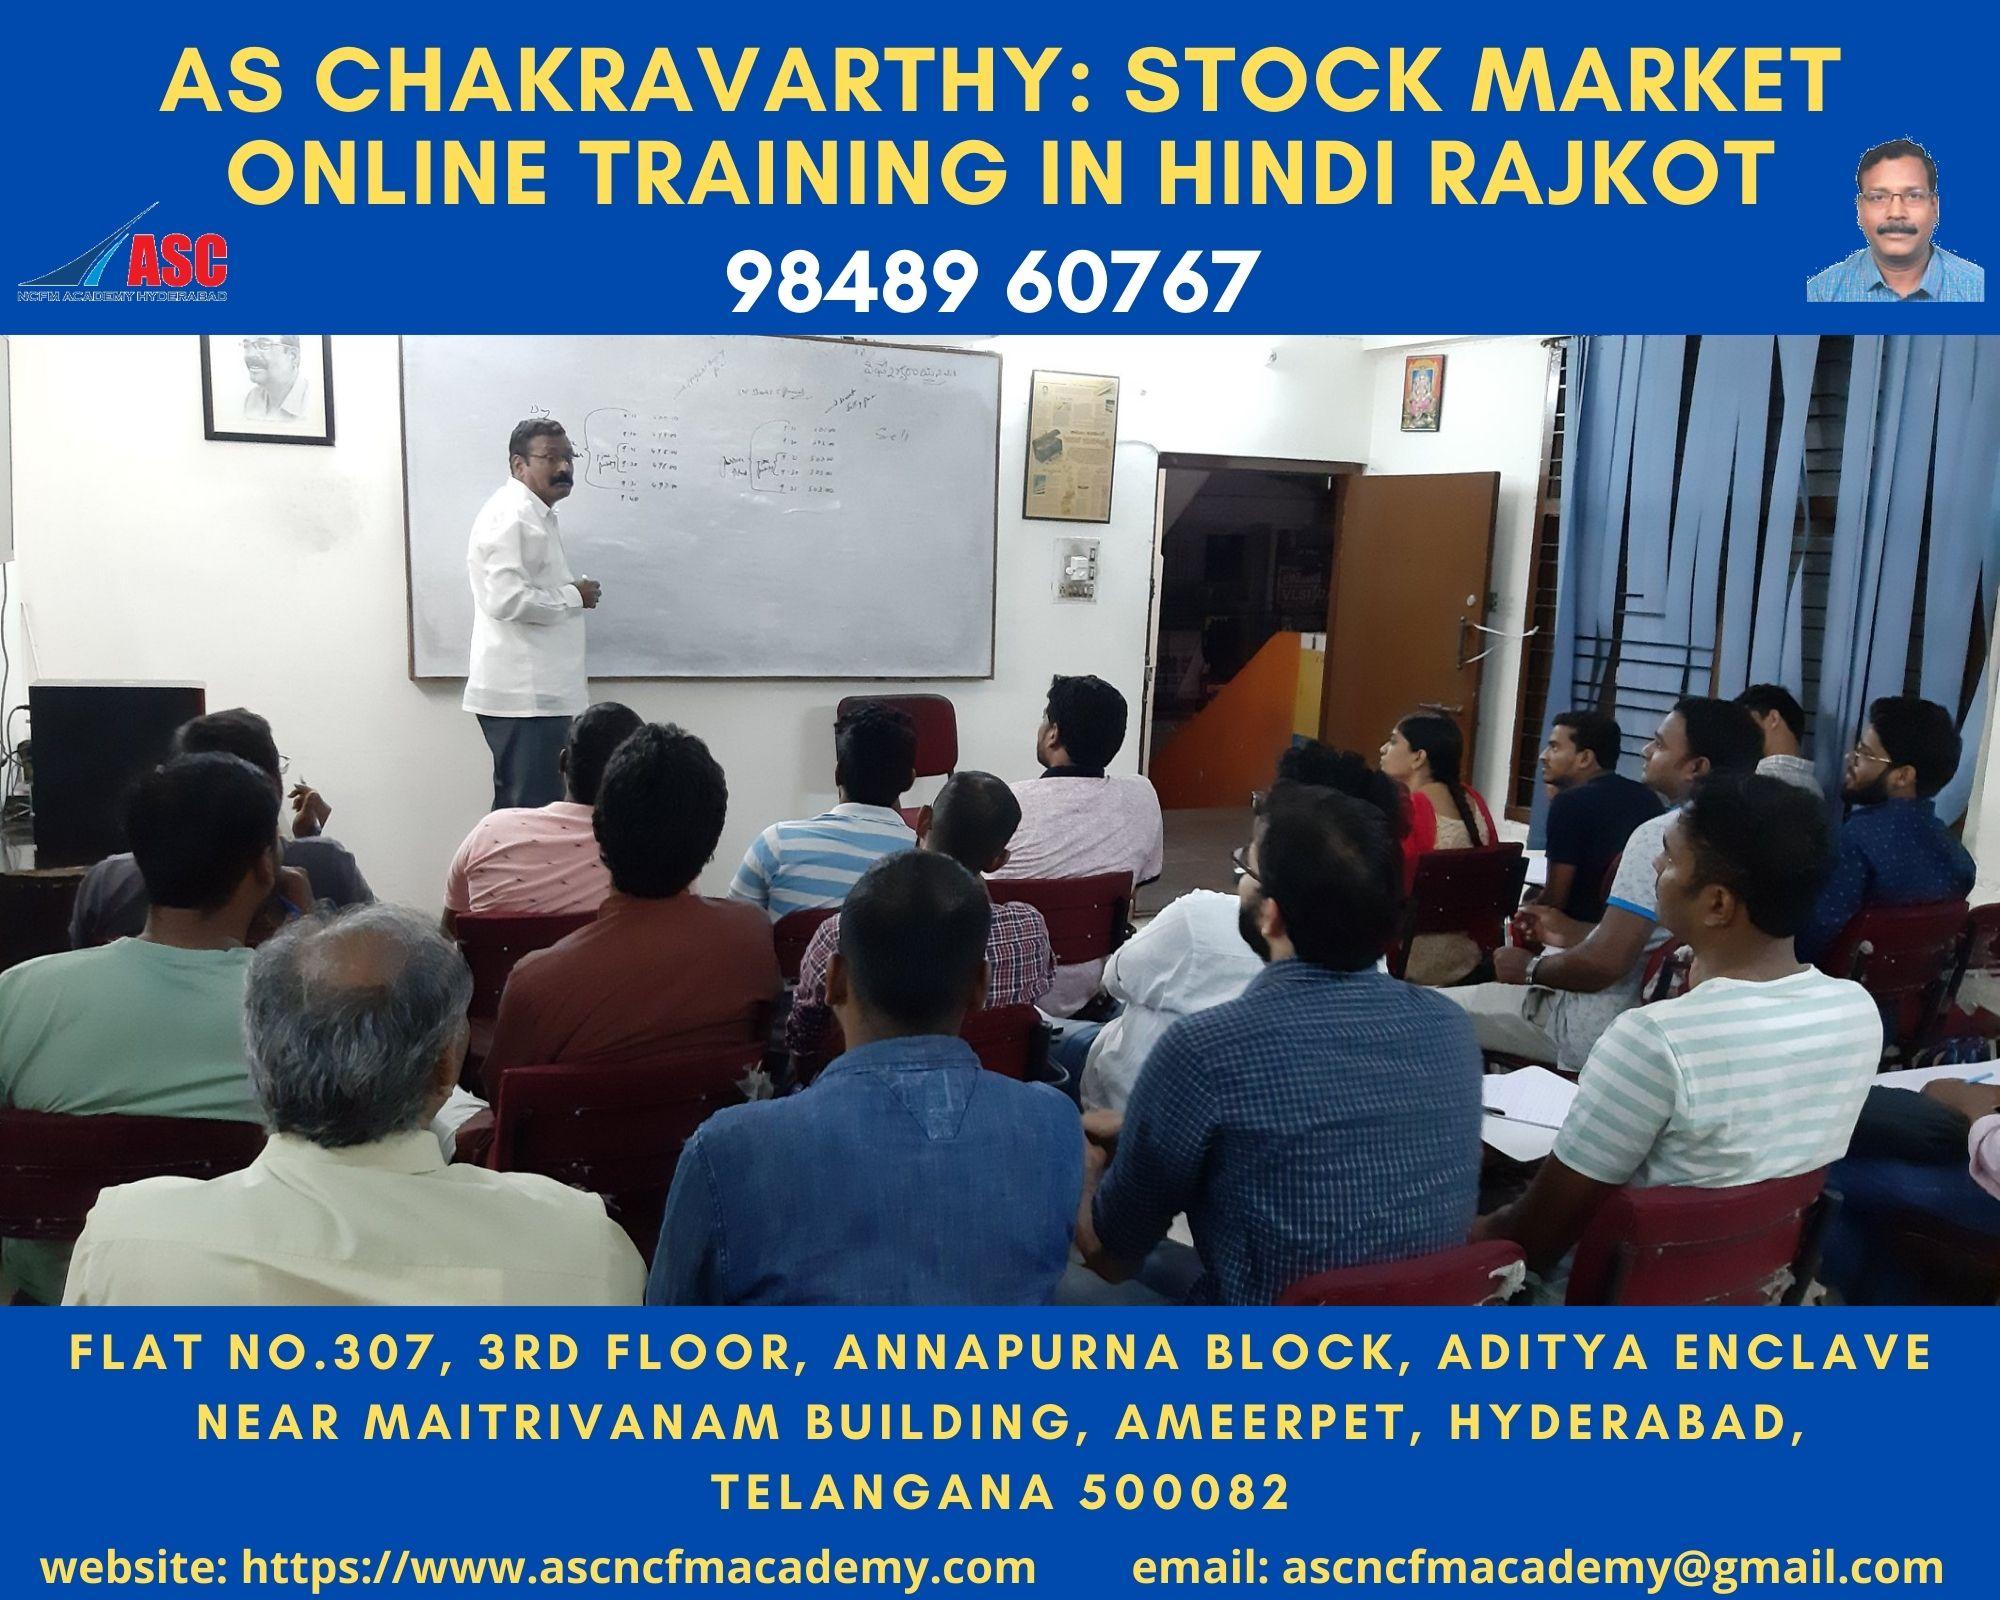 Online Stock Market Technical Training in Hindi Rajkot